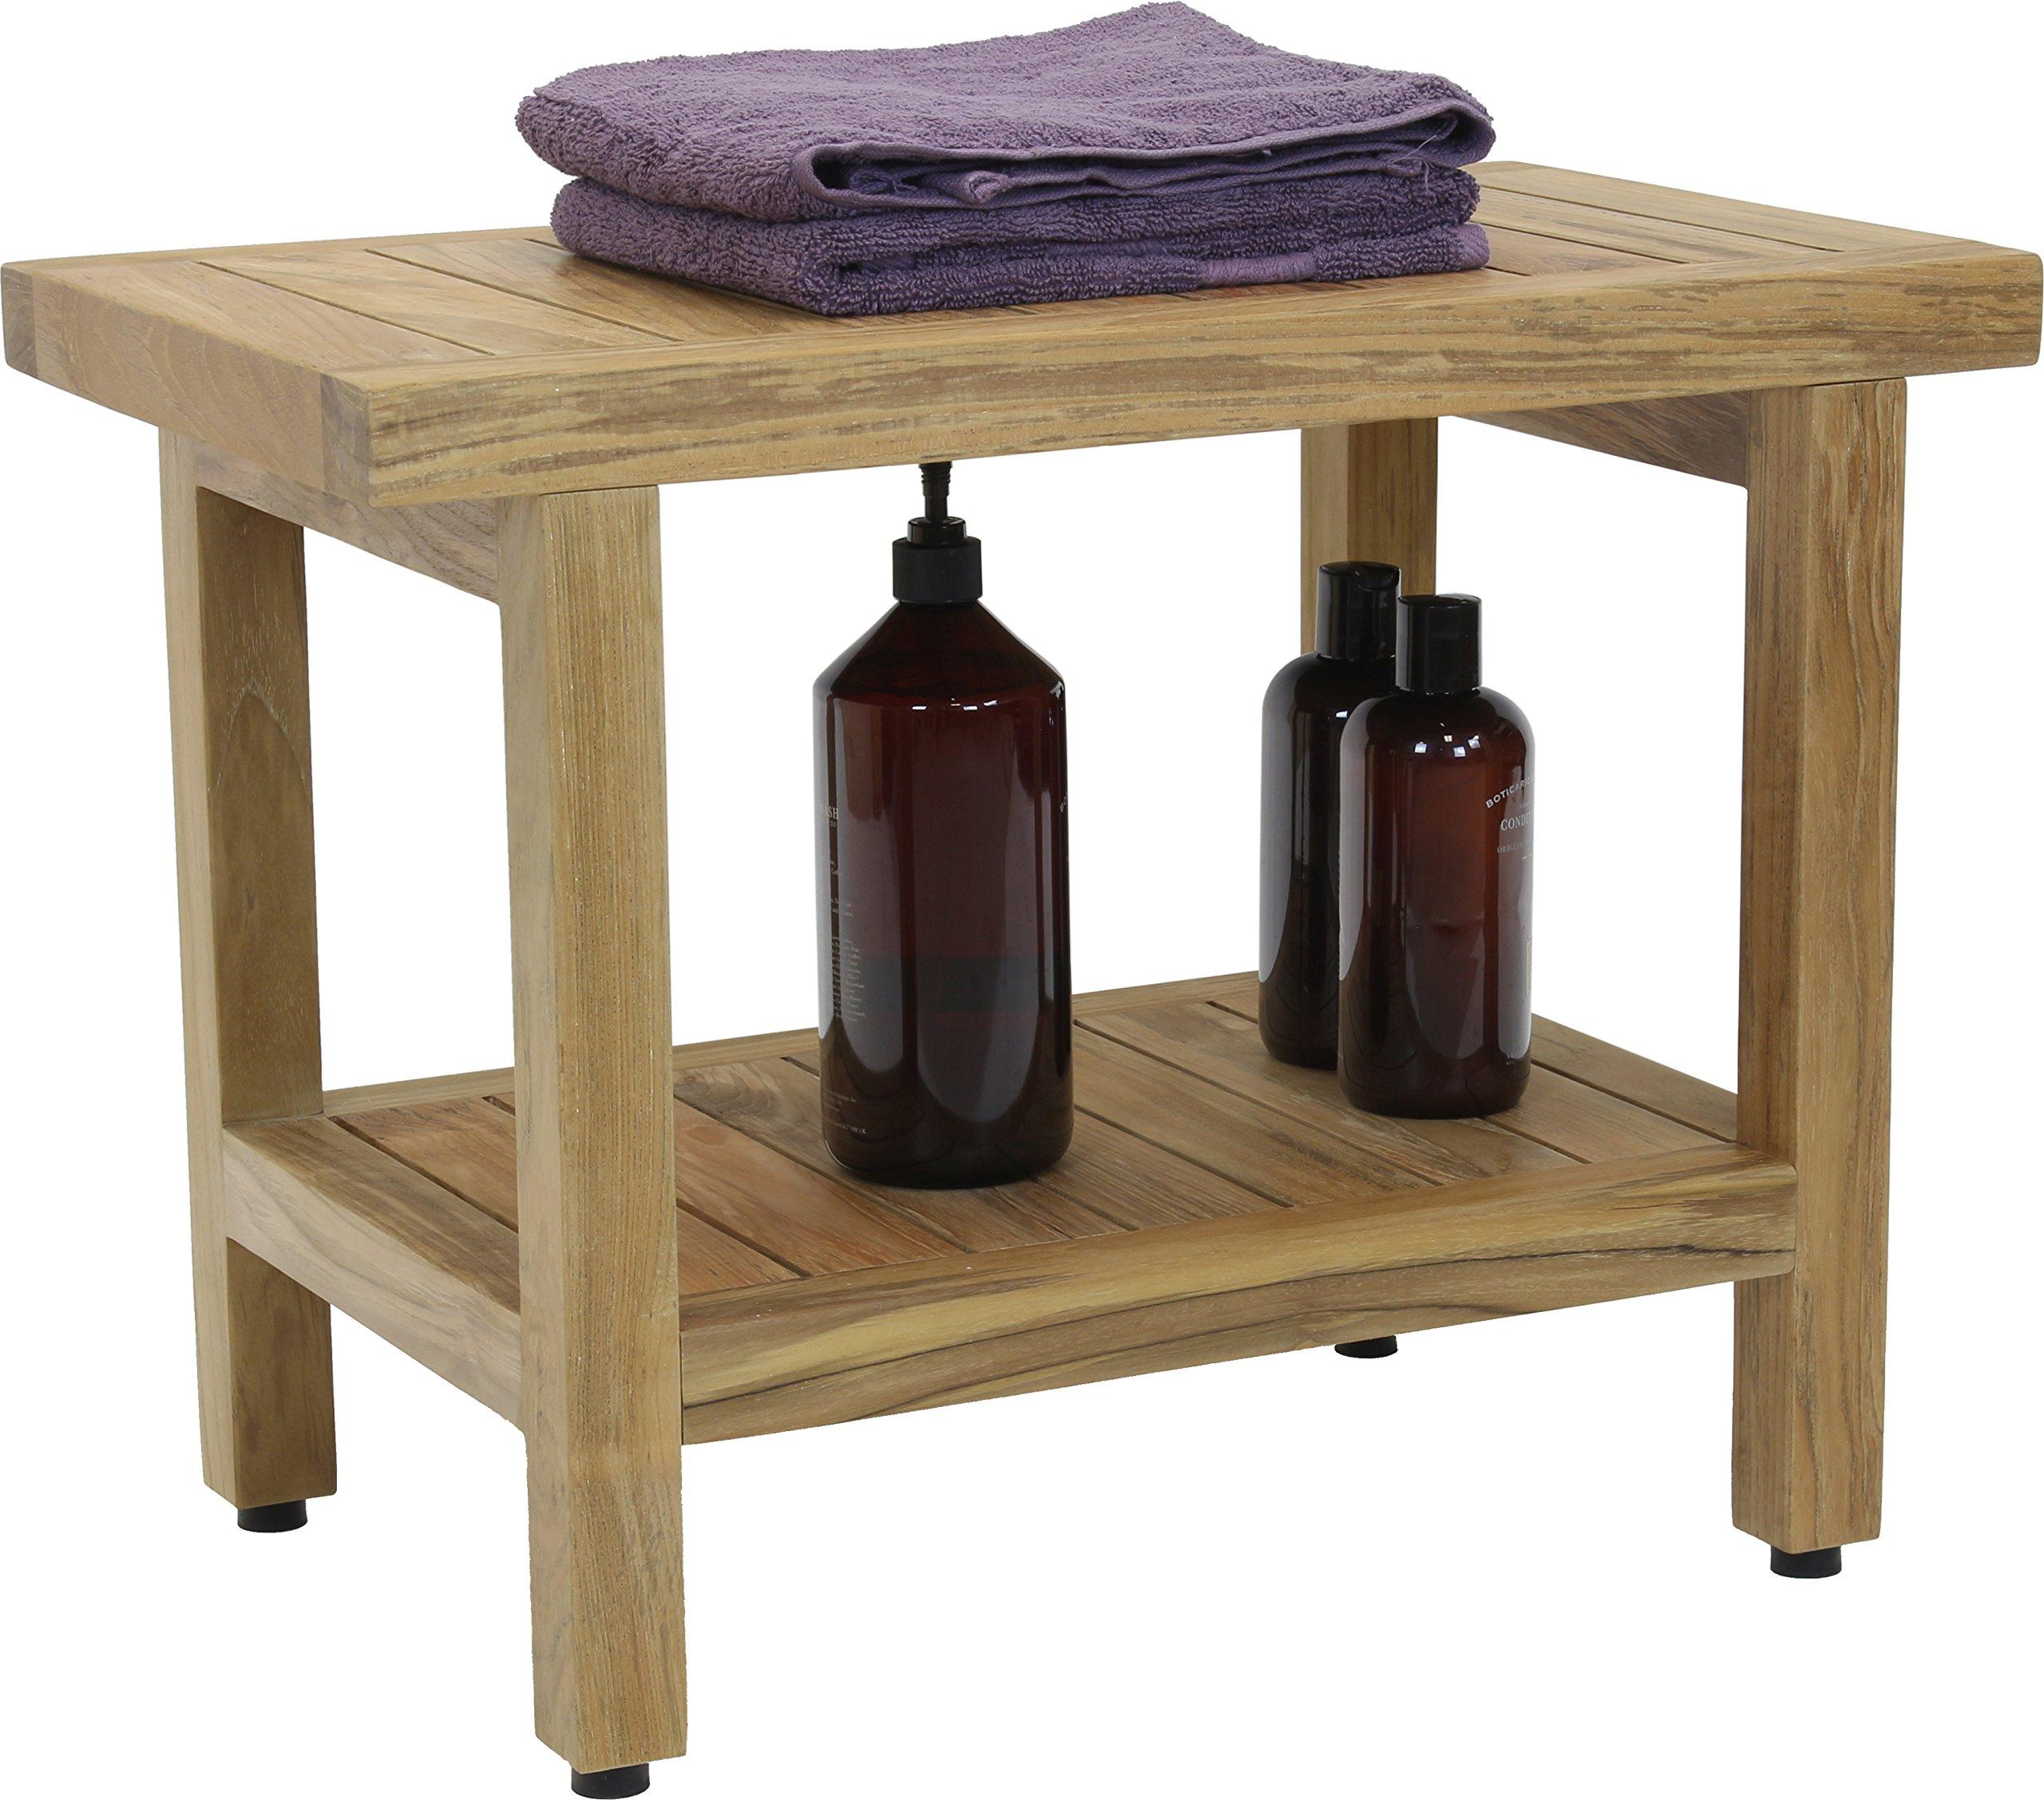 24'' Spa Natural Teak Shower Bench with Shelf by AquaTeak (Image #6)